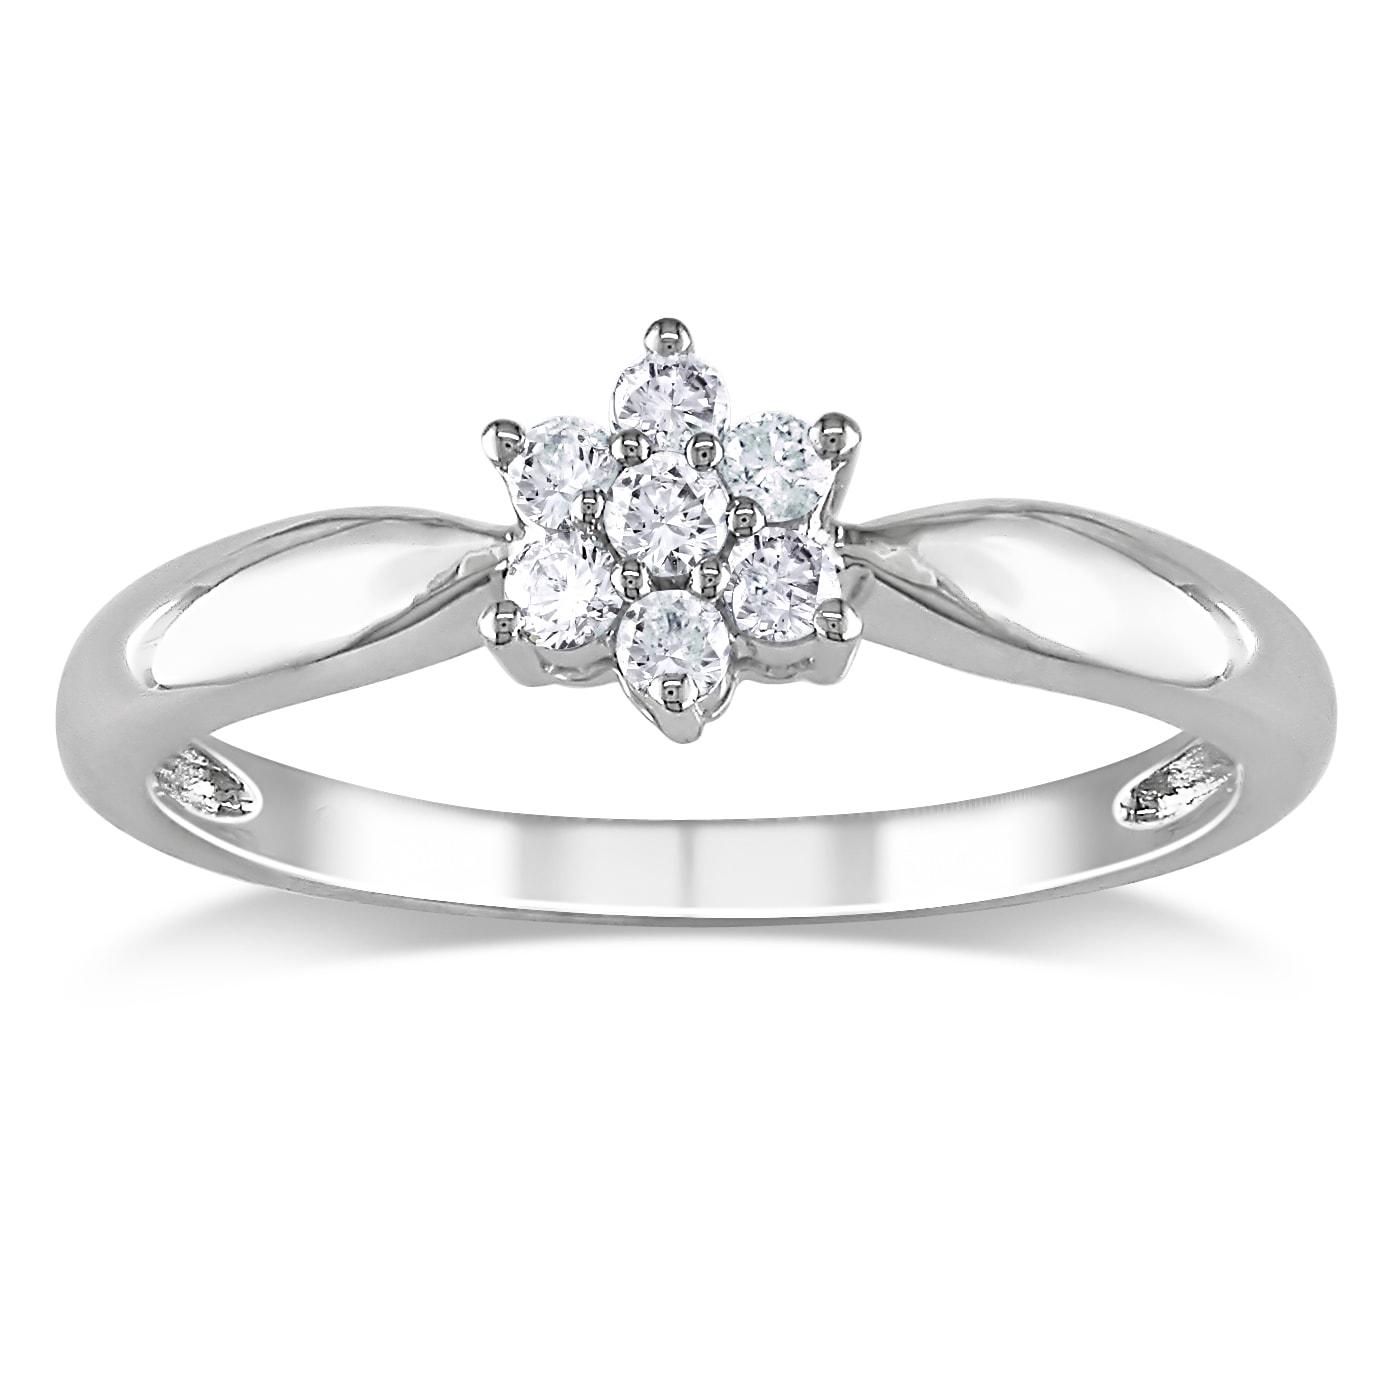 Miadora 10k White Gold 1/6ct TDW Diamond Flower Ring (H-I, I2-I3)